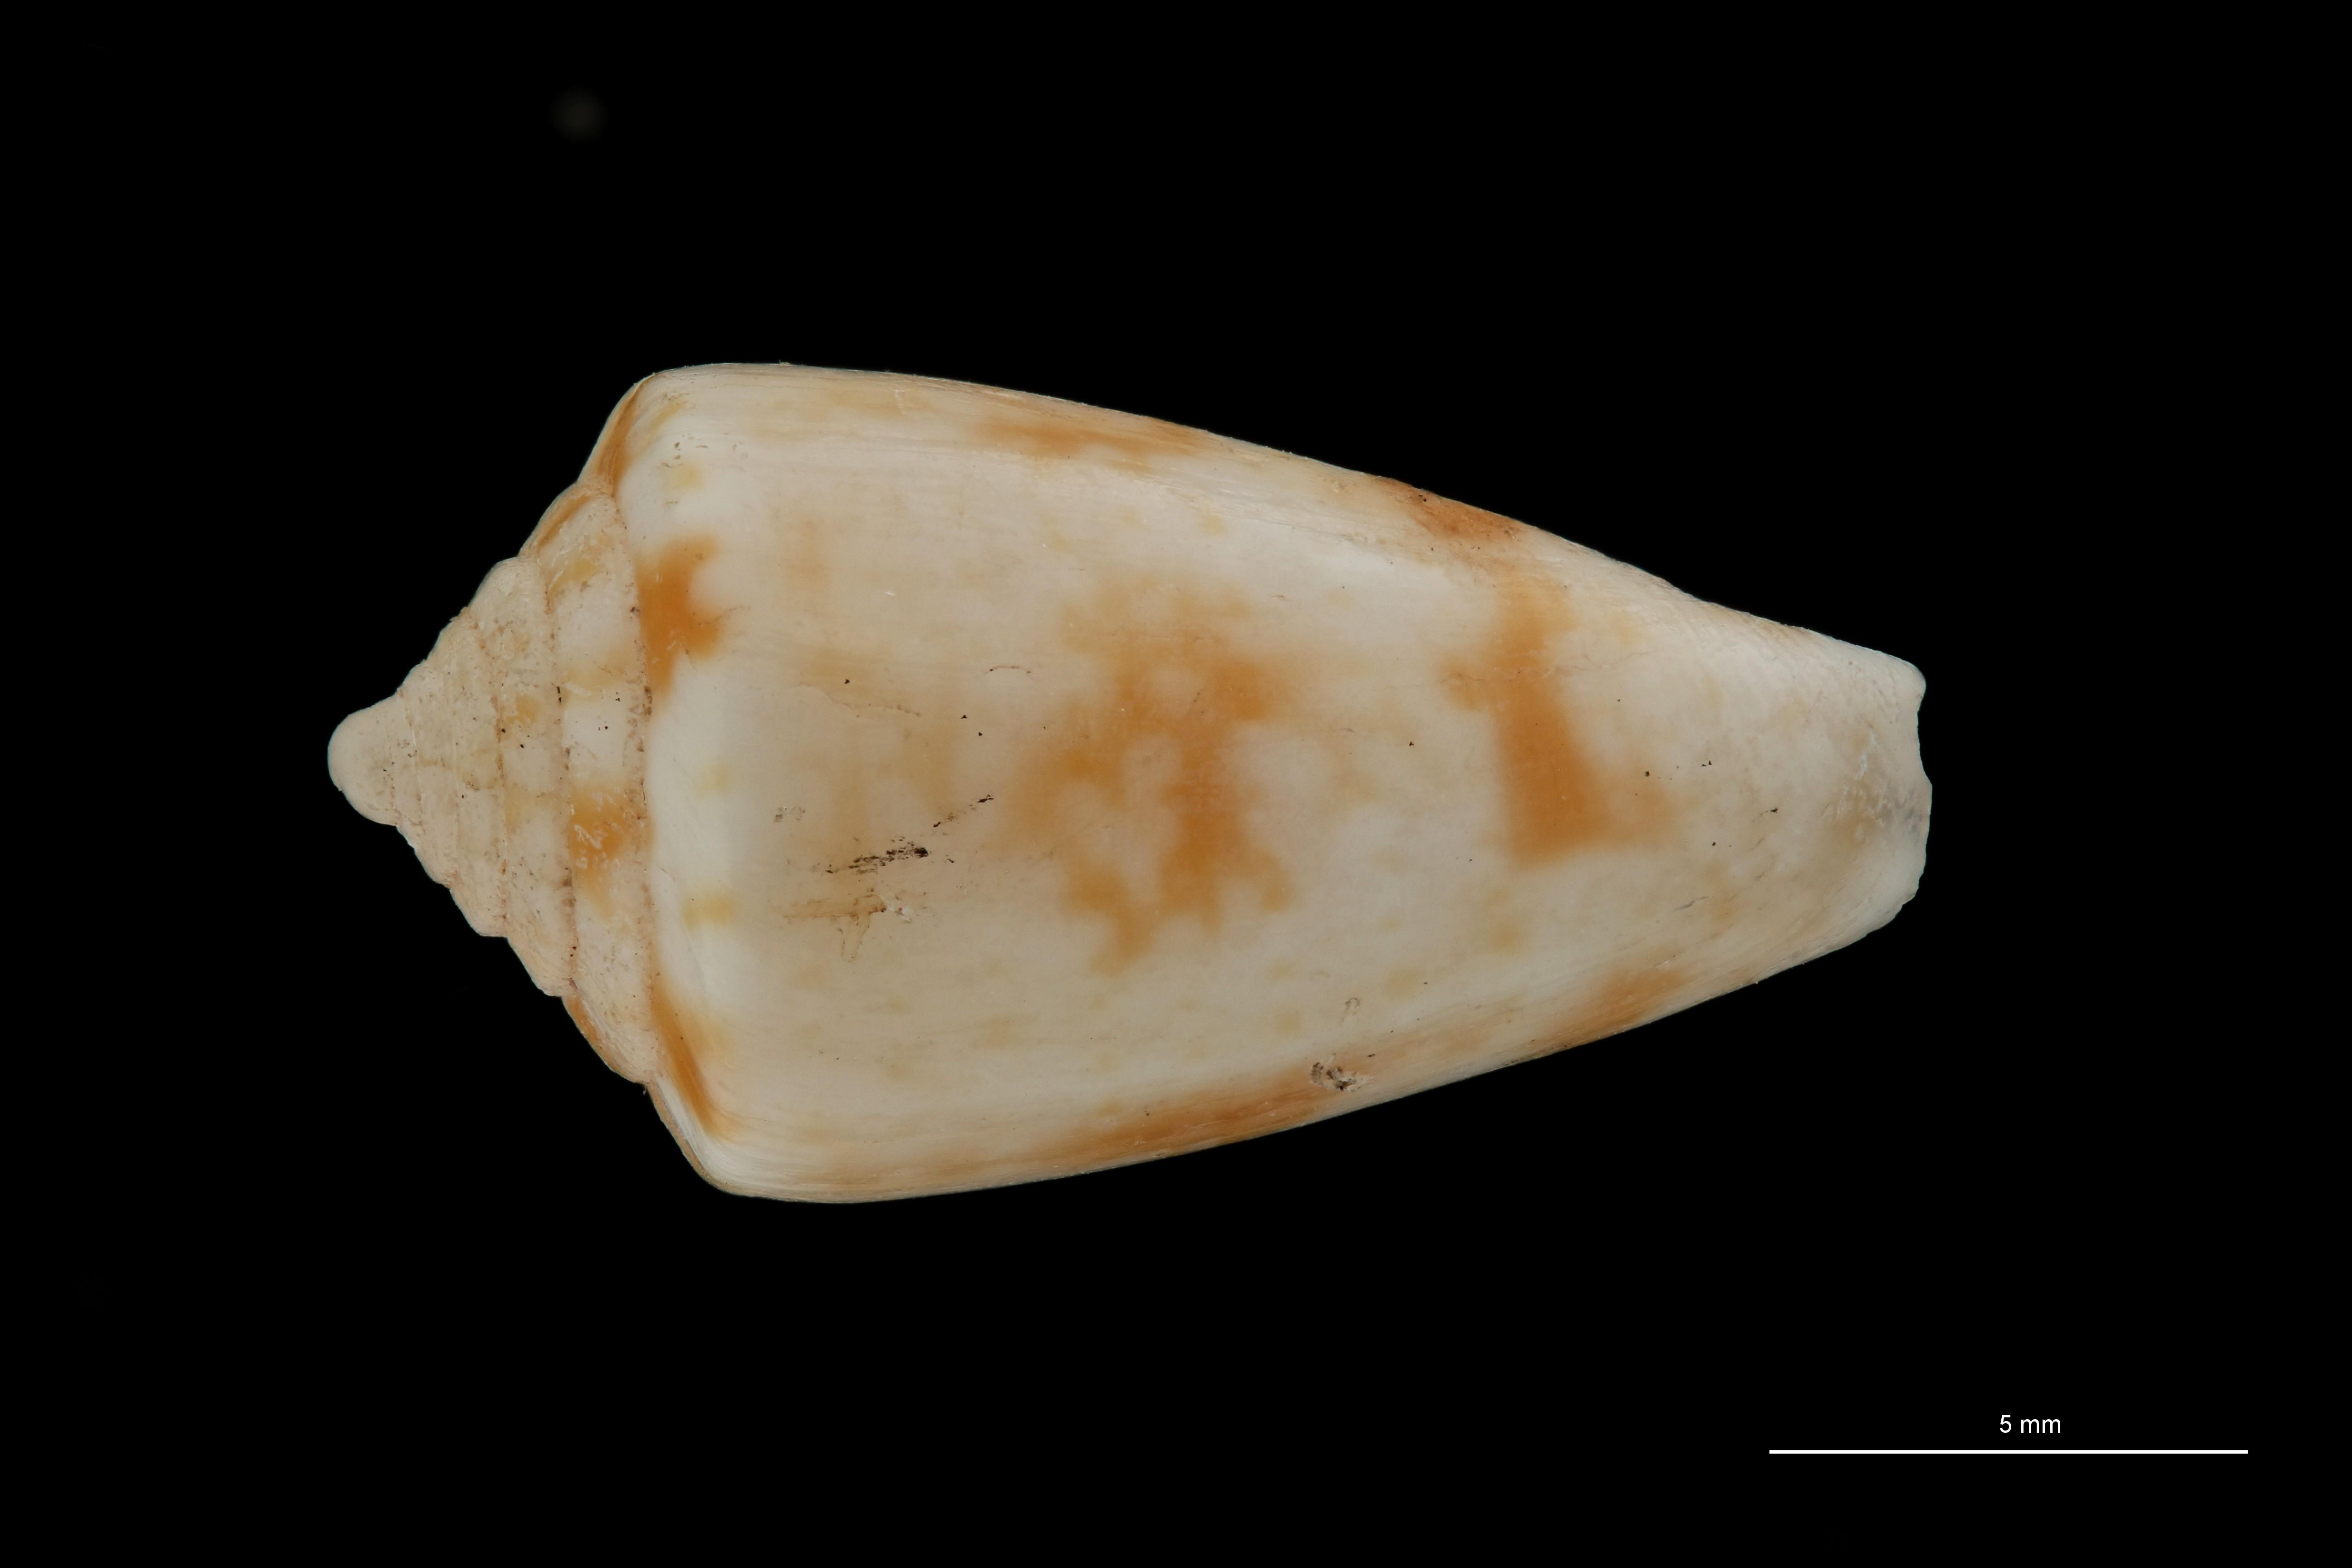 BE-RBINS-INV PARATYPE MT.3031 Conus gerdae DORSAL ZS PMax Scaled.jpg